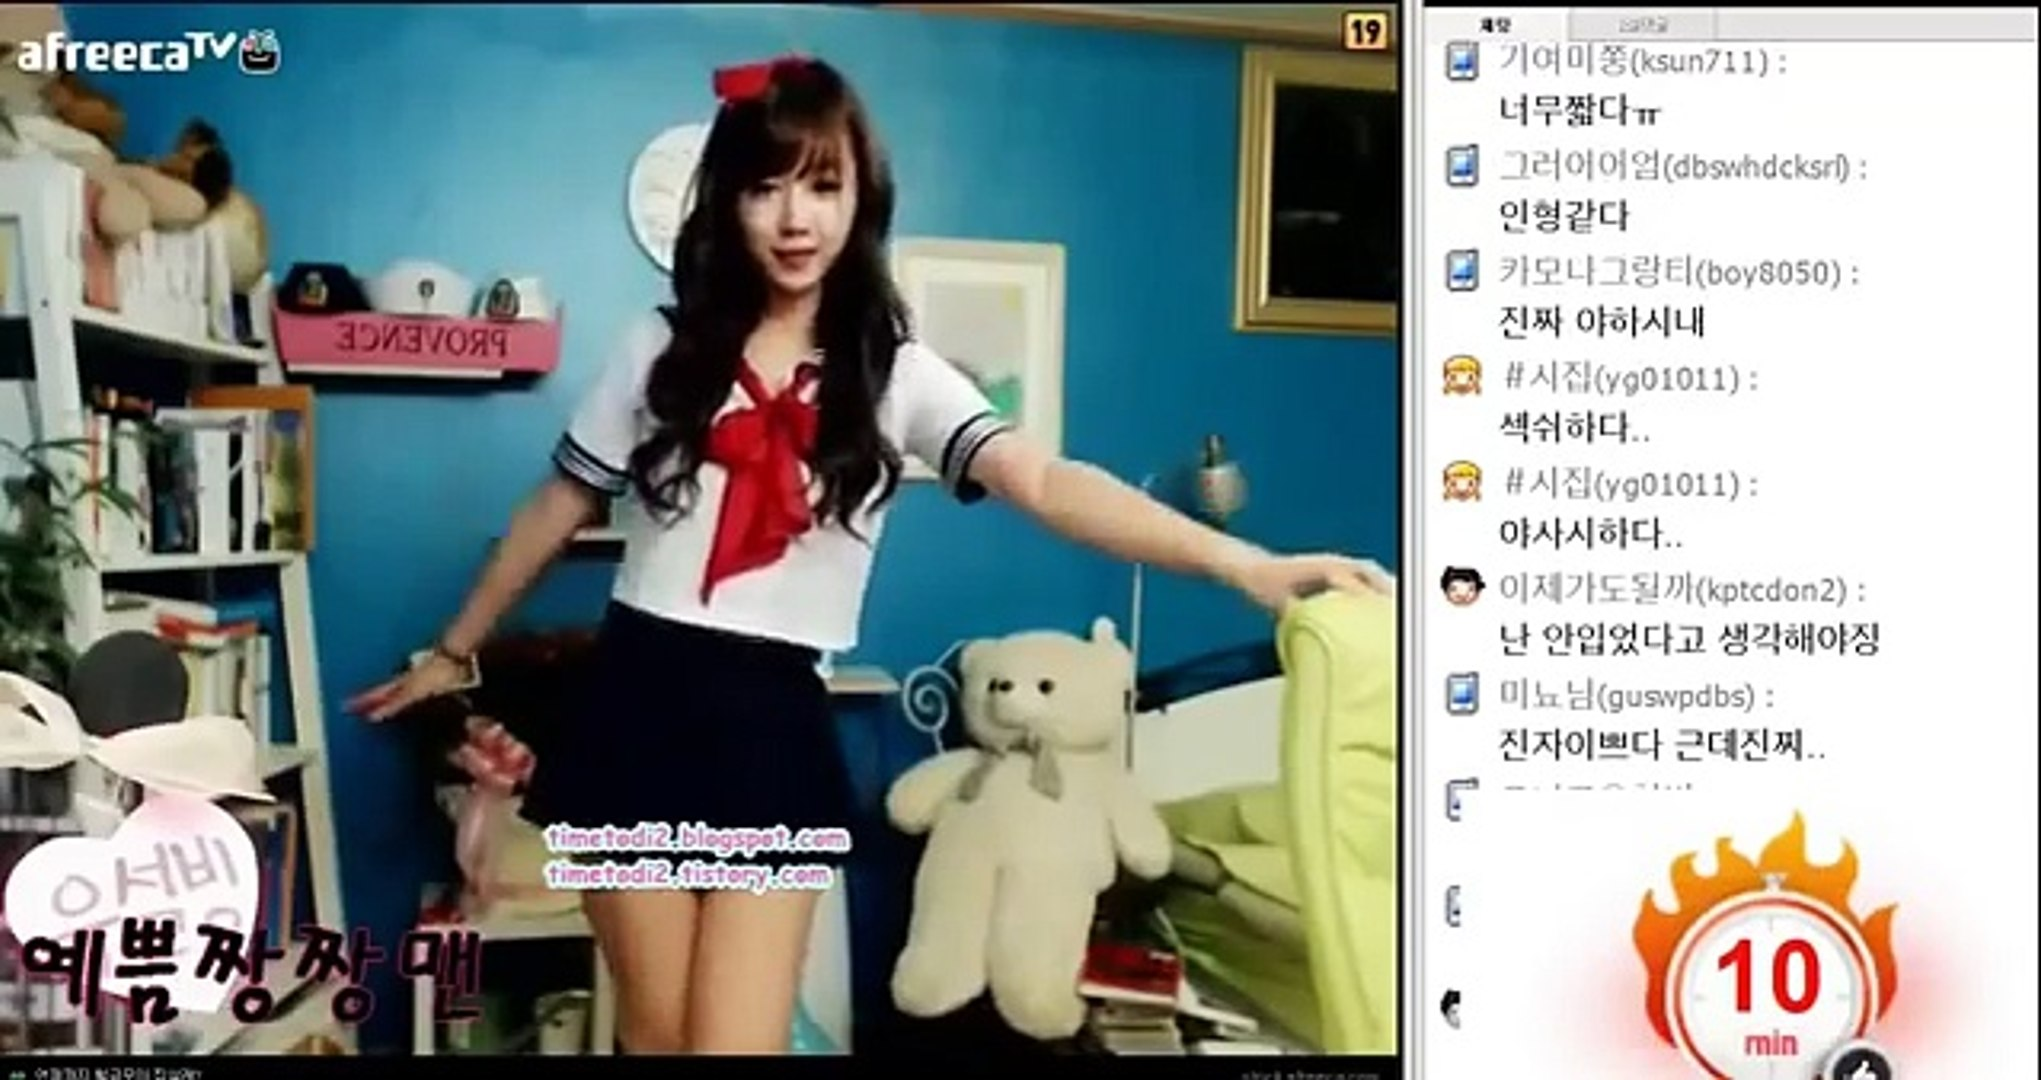 Cute Sexy Hot Korean Girl Funny Prank